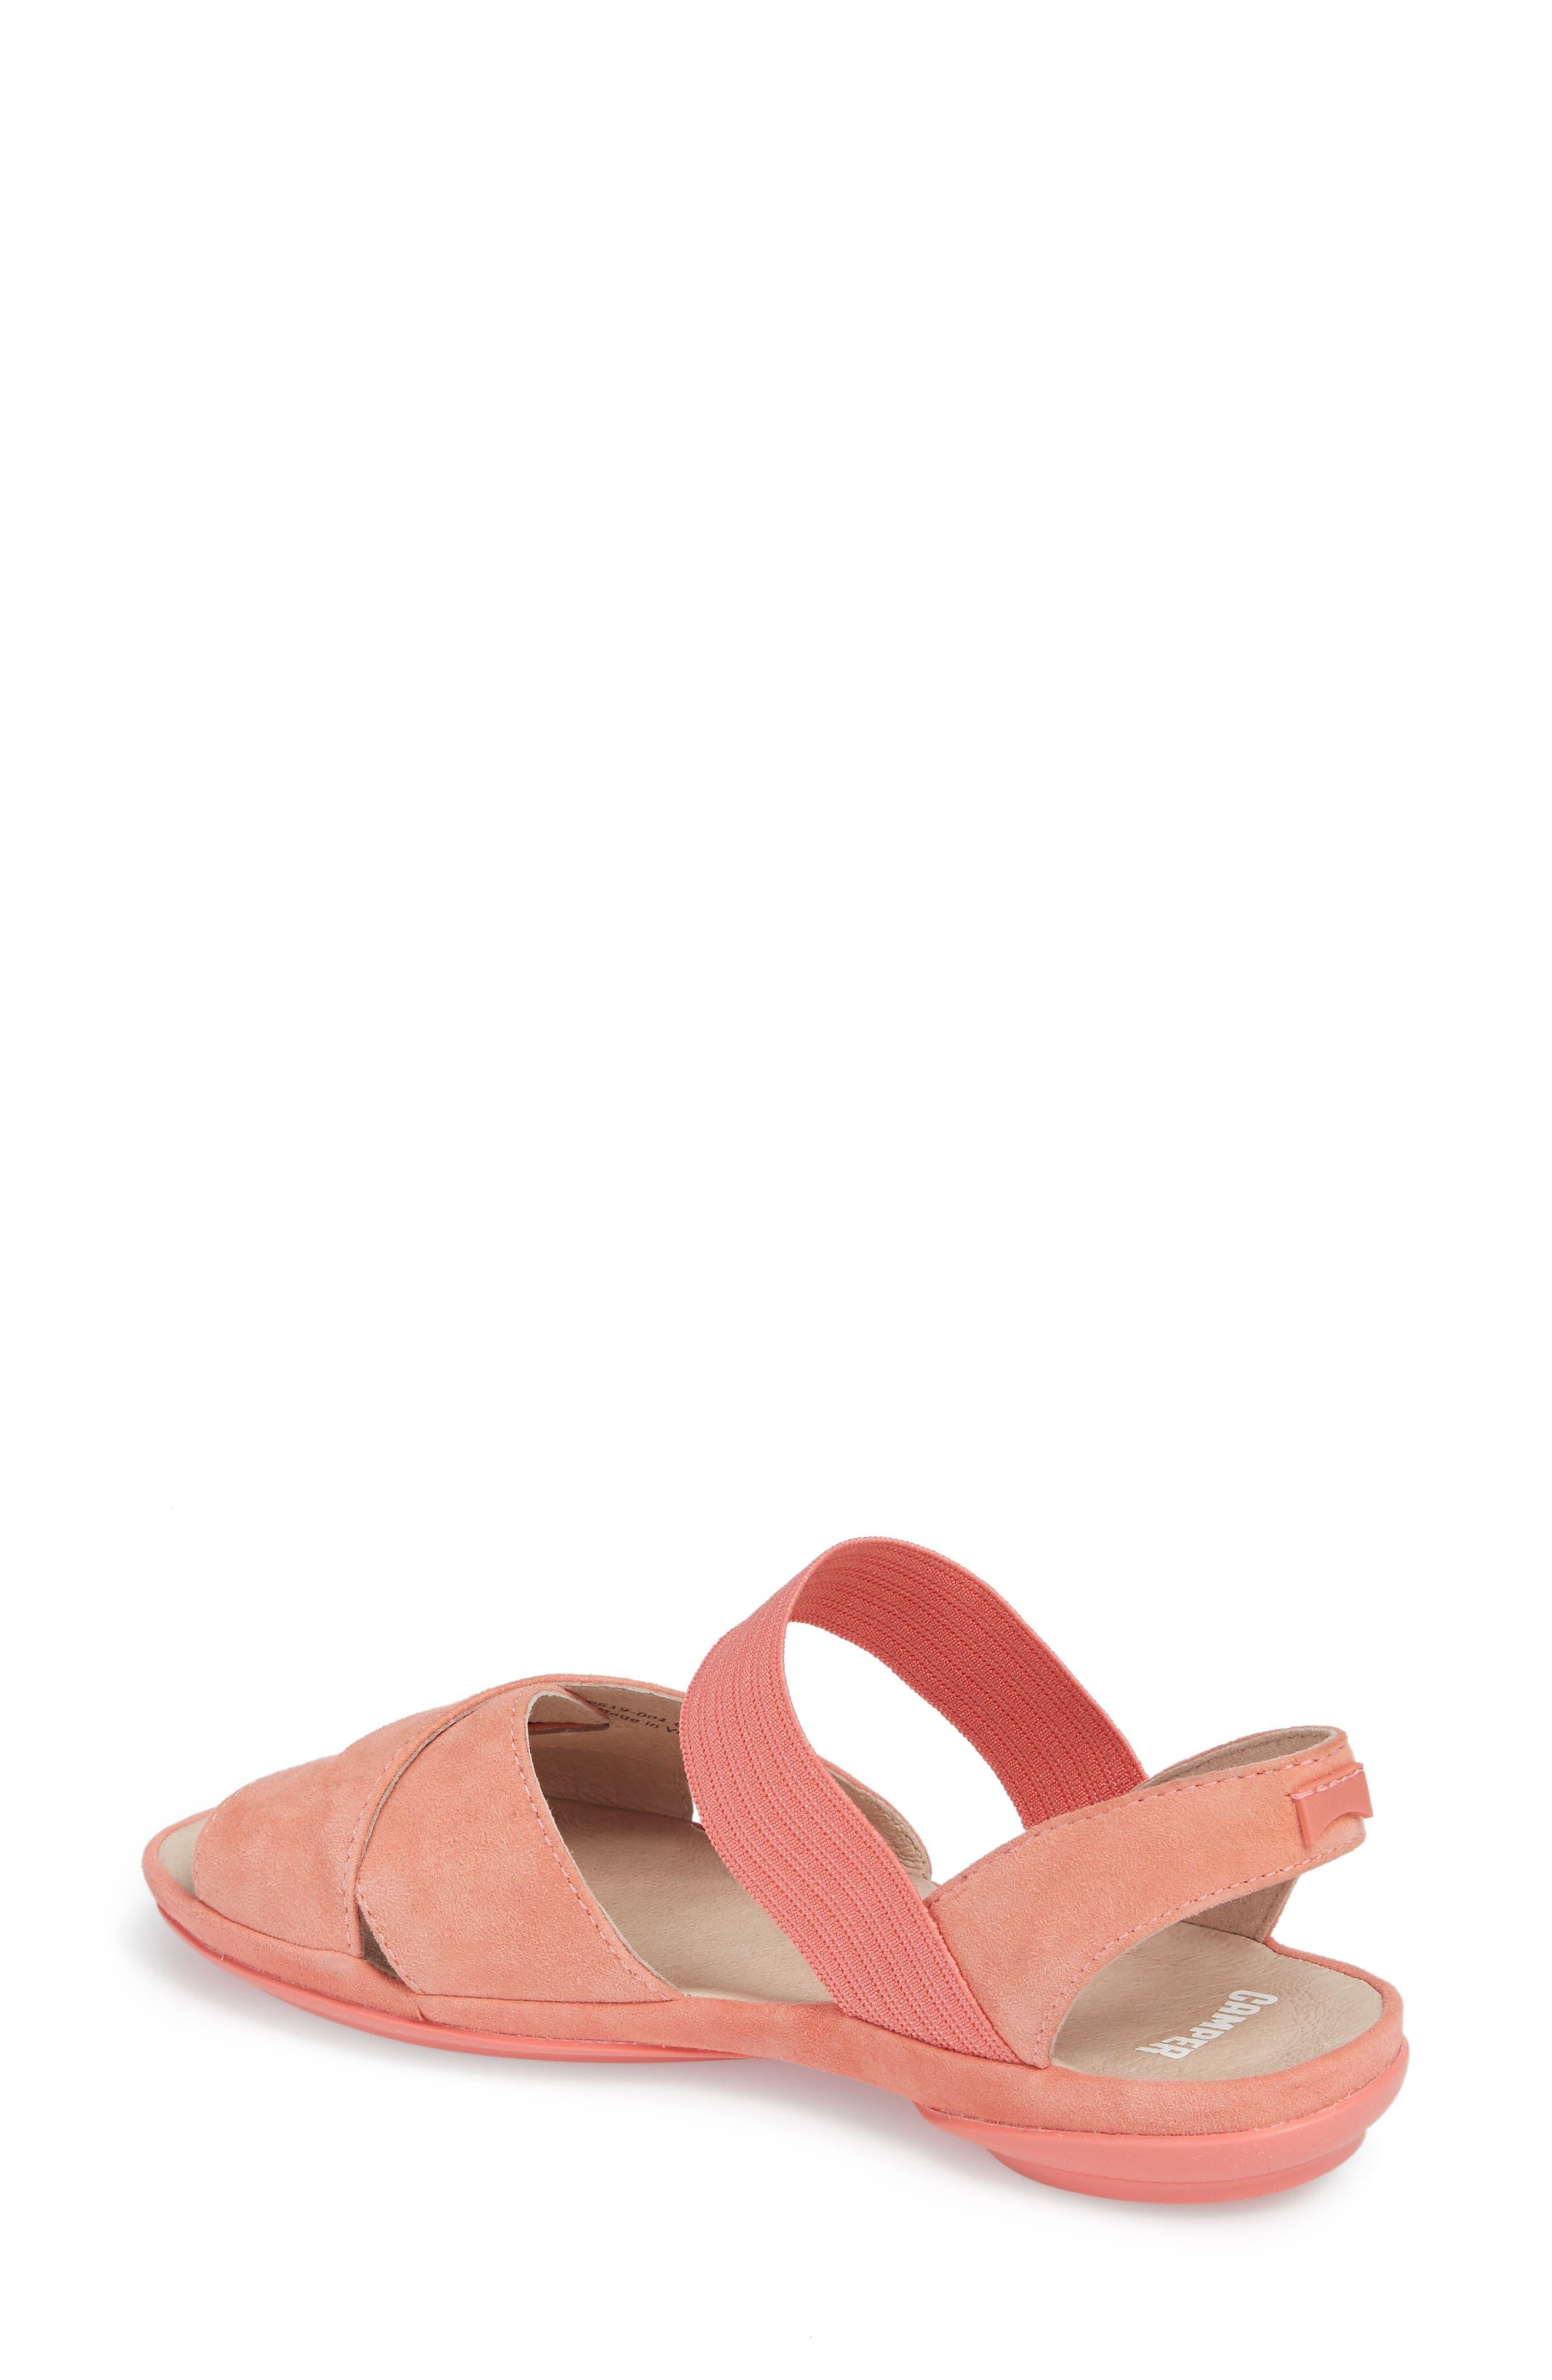 Right Nina Flat Cross Strap Sandal,                             Alternate thumbnail 2, color,                             Medium Pink Leather